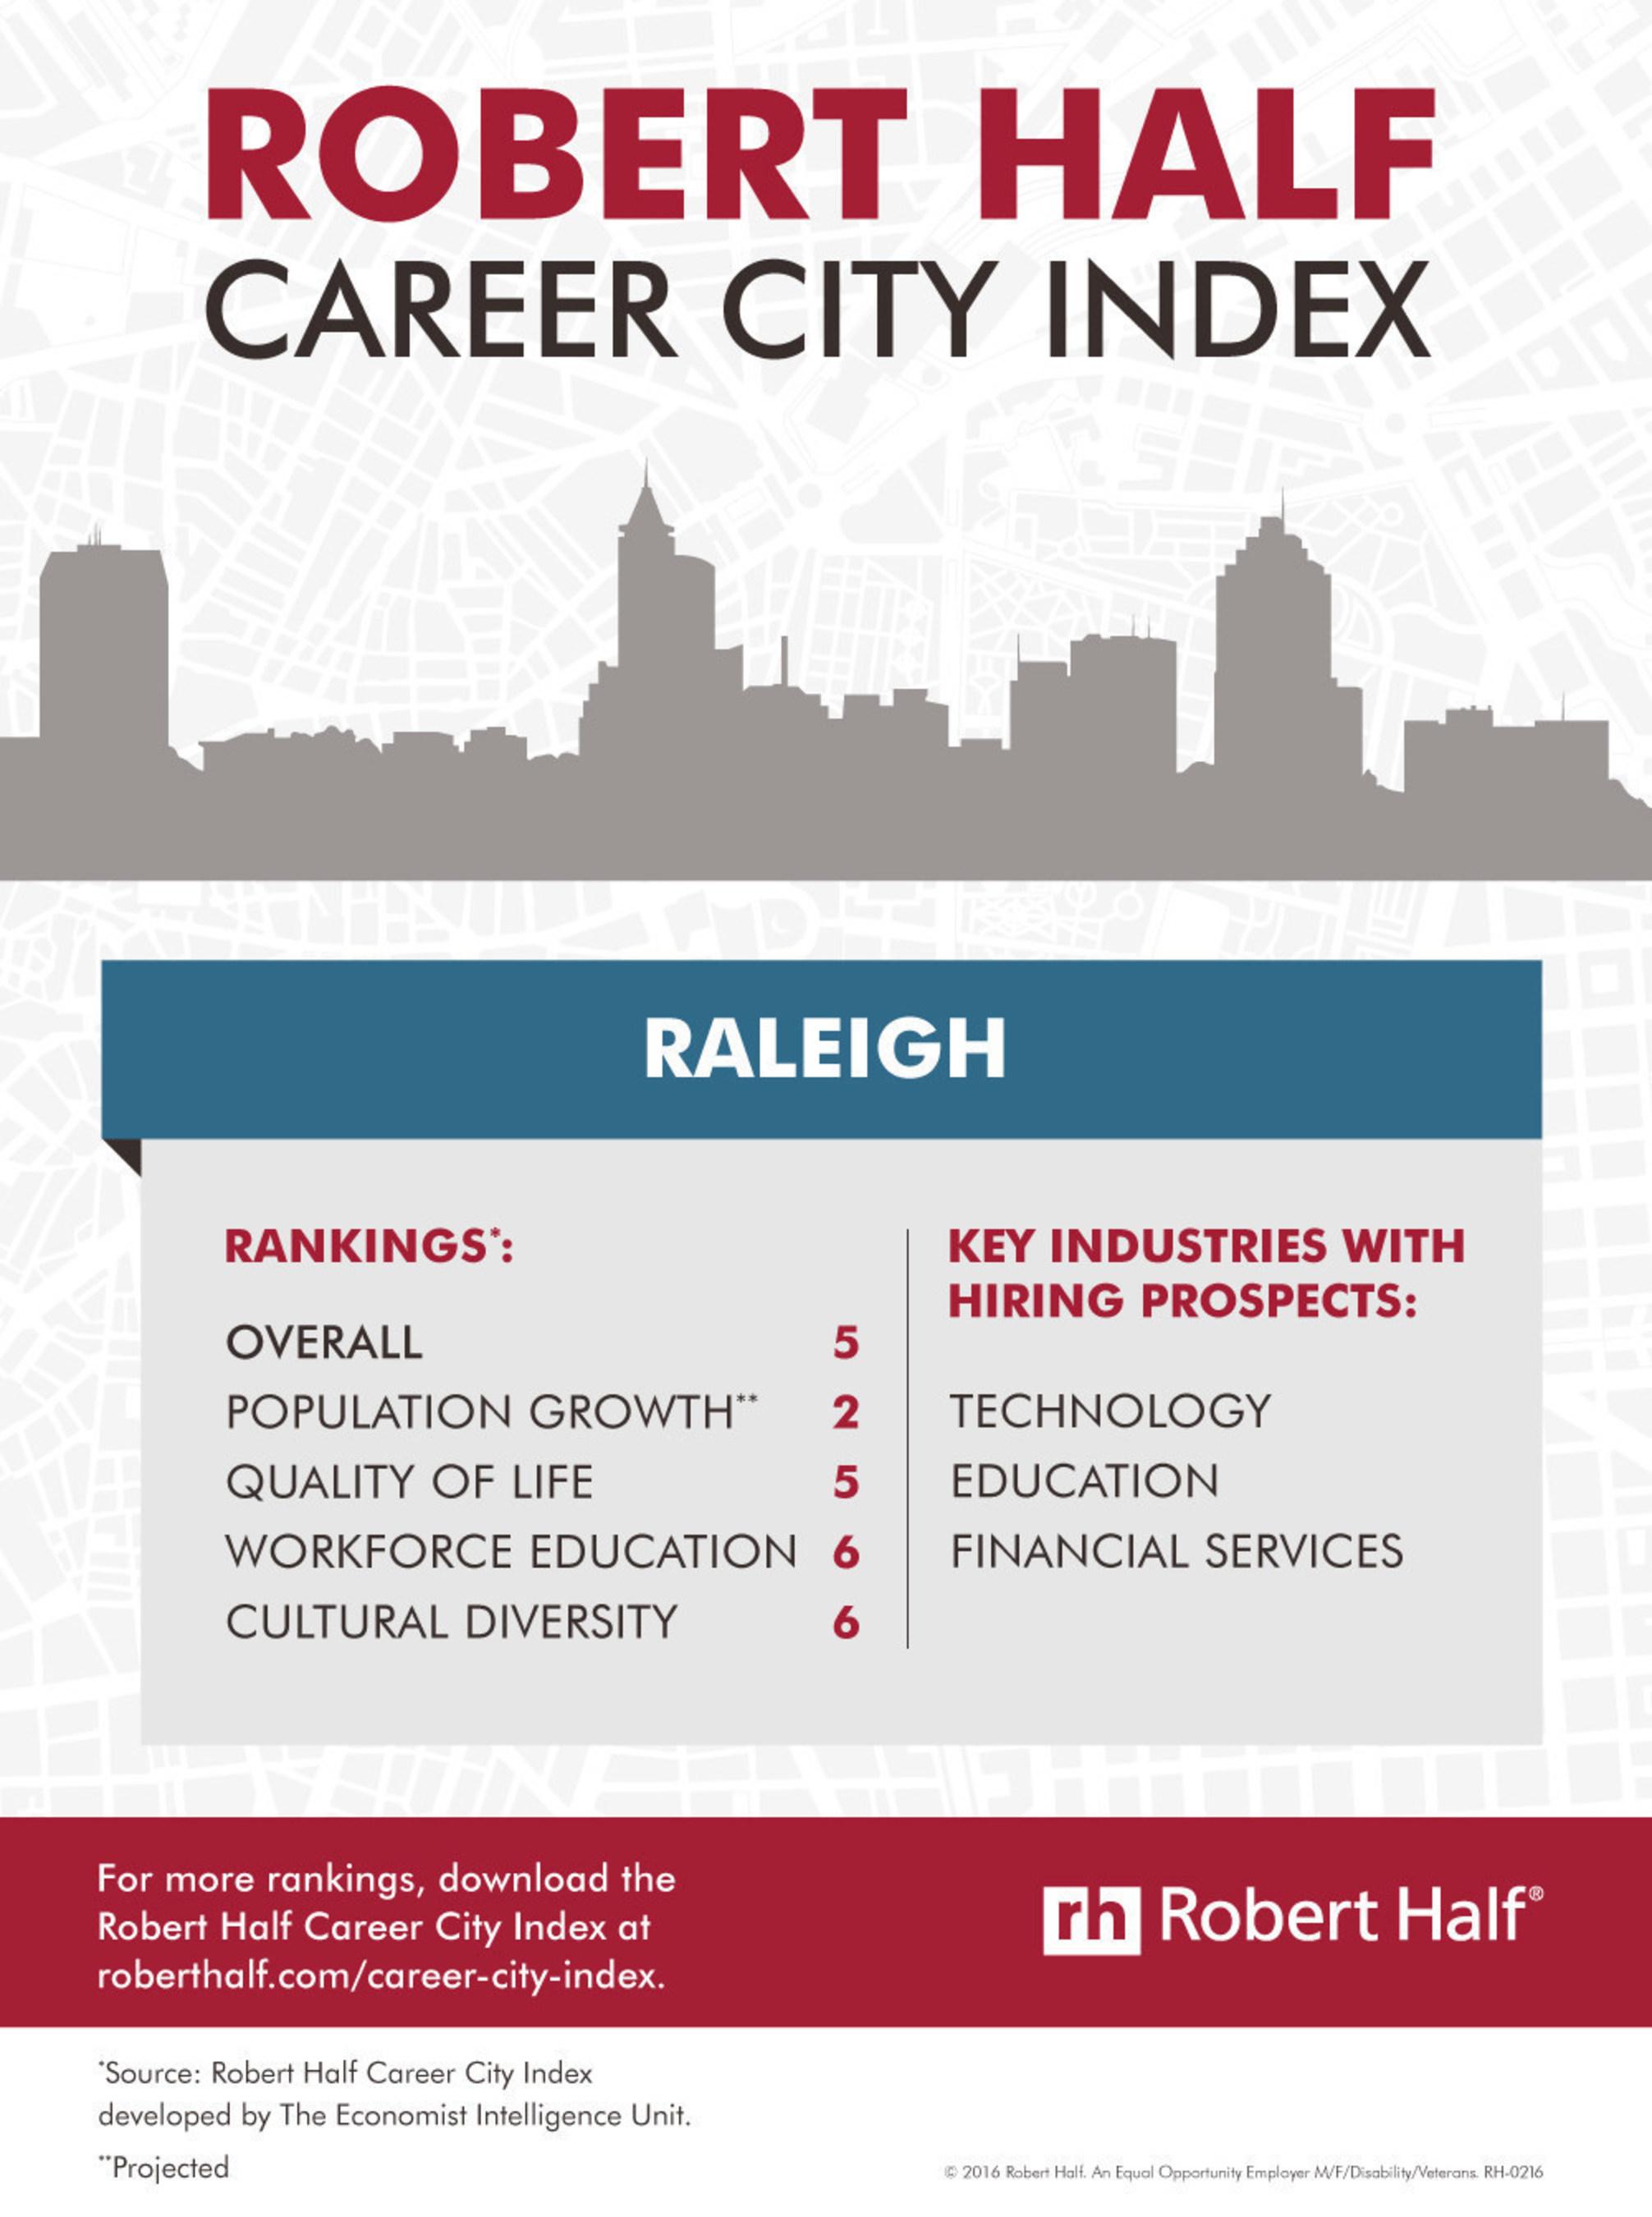 Robert Half Career City Index - Raleigh